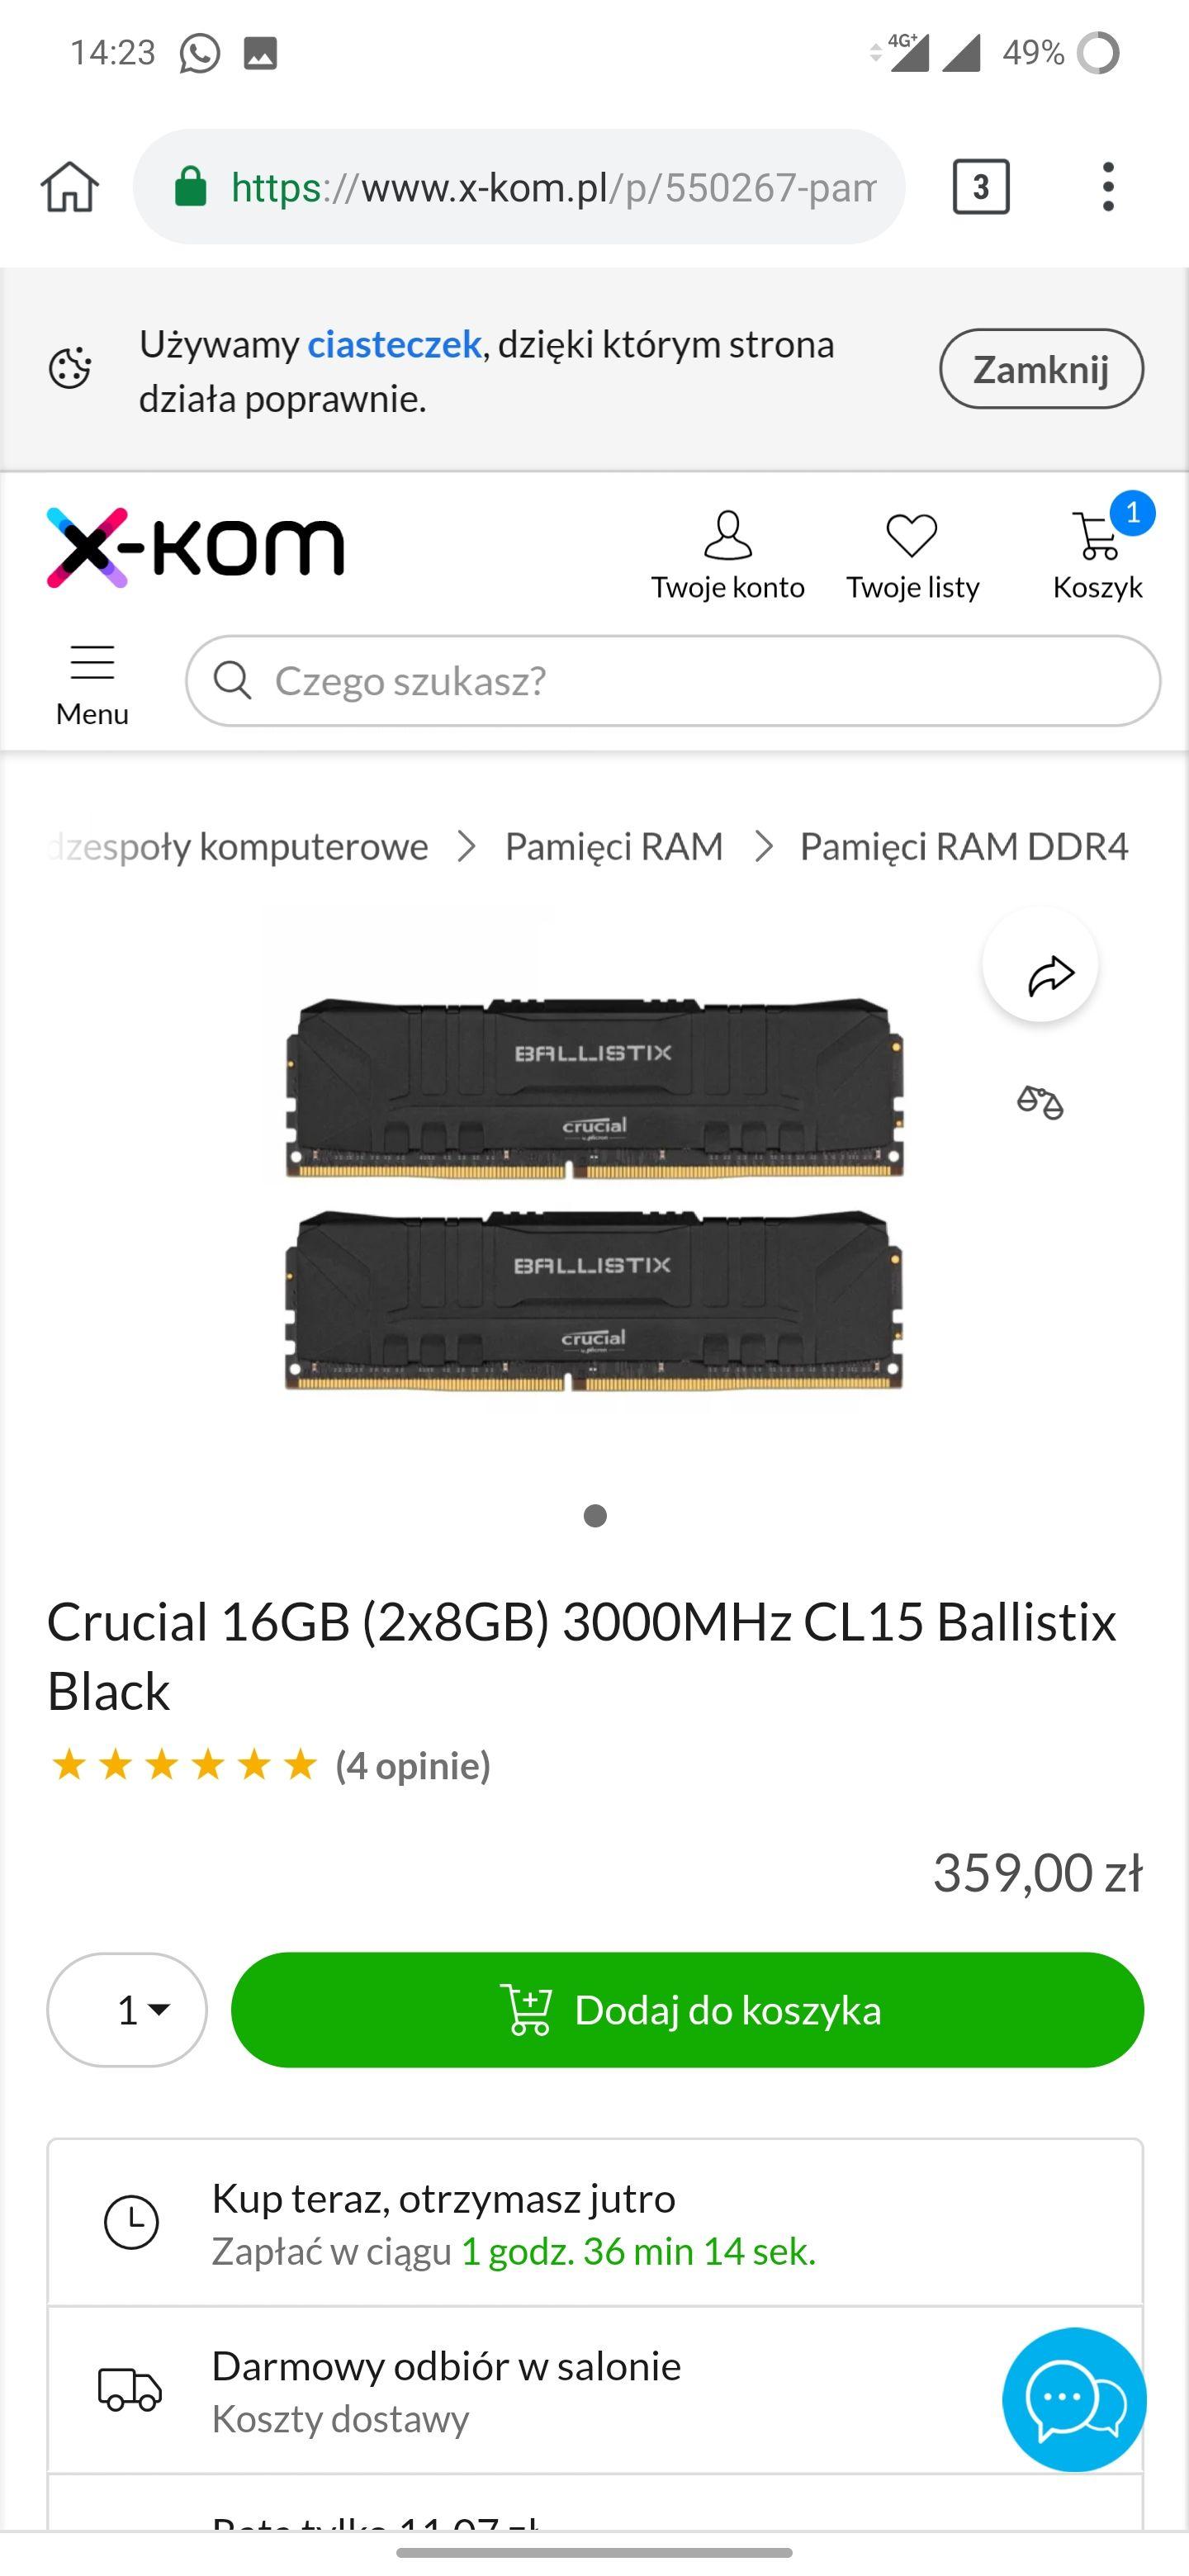 Pamięć RAM Crucial 16GB (2x8GB) 3000MHz CL15 Ballistix Black